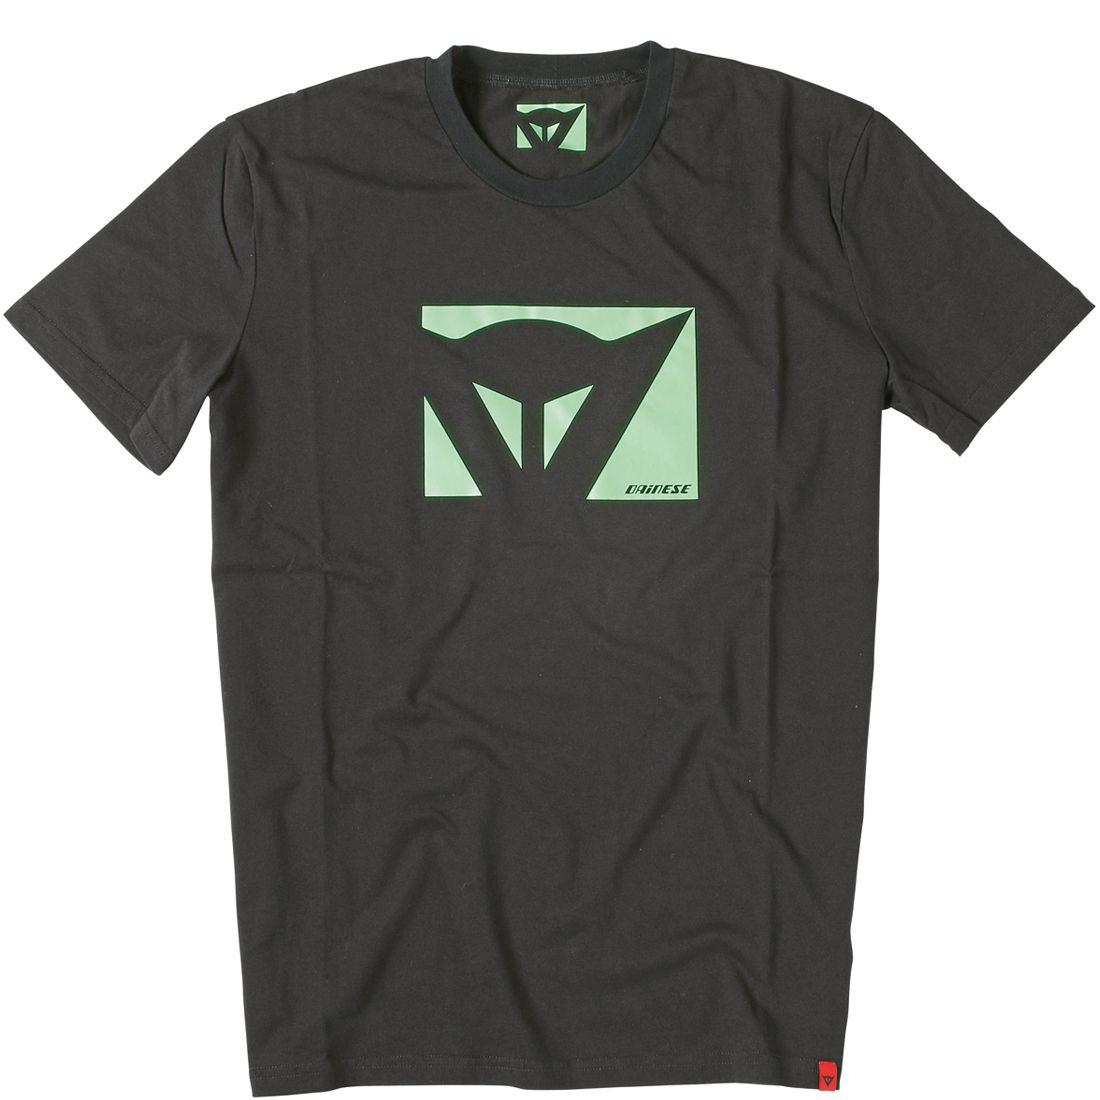 【DAINESE】COLOR NEW T恤 - 「Webike-摩托百貨」